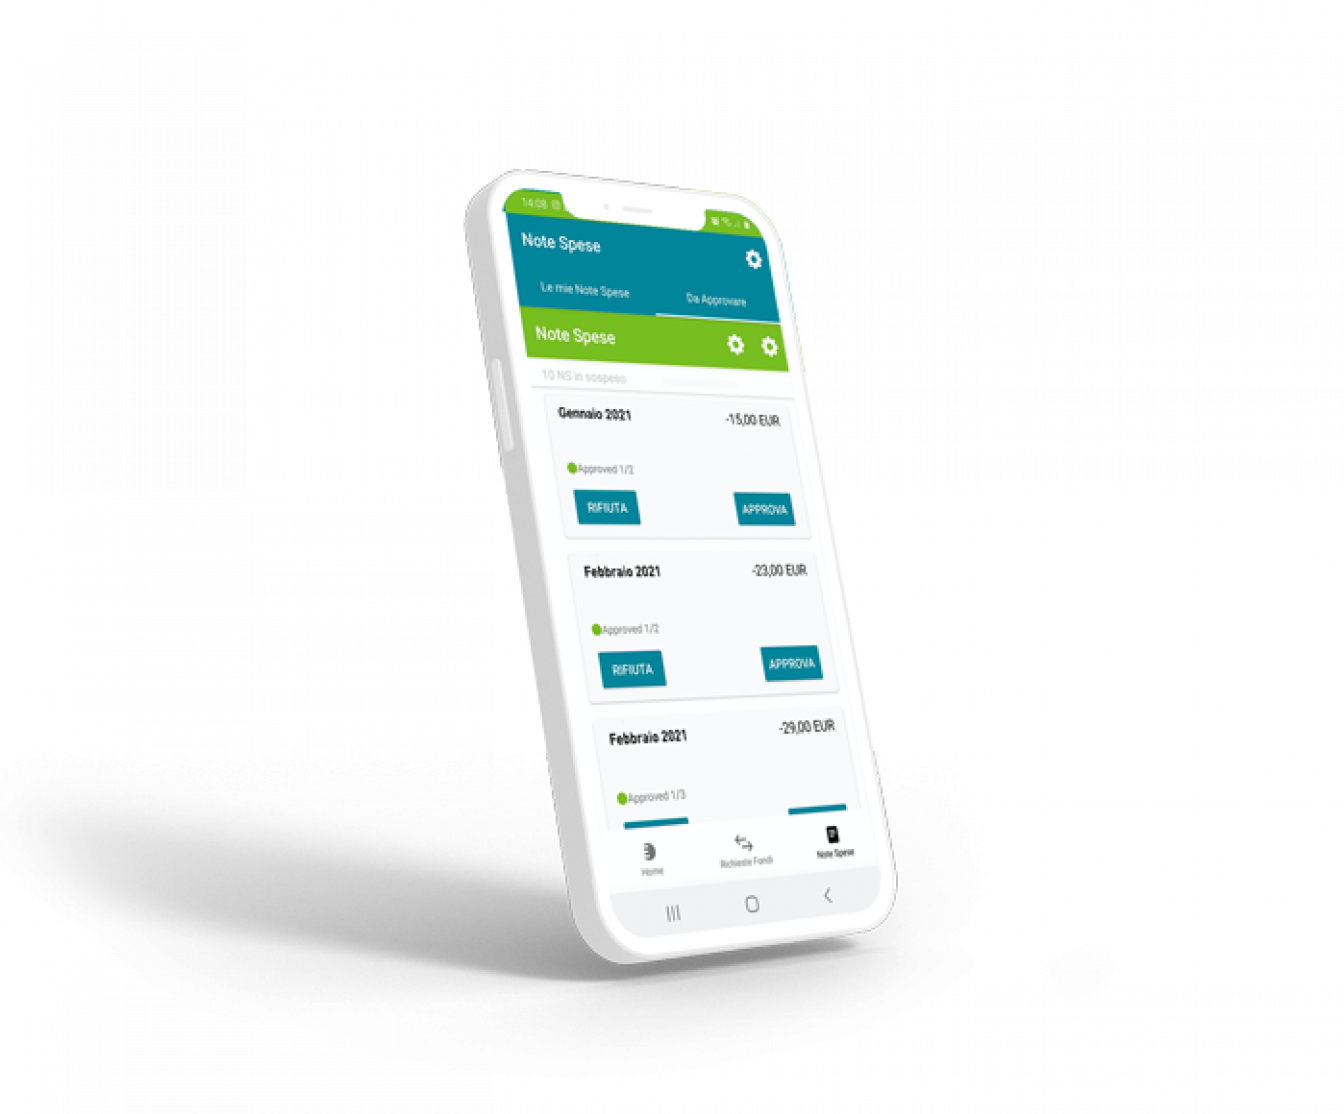 App-ExpendiaSmart-Edenred-nota-spese